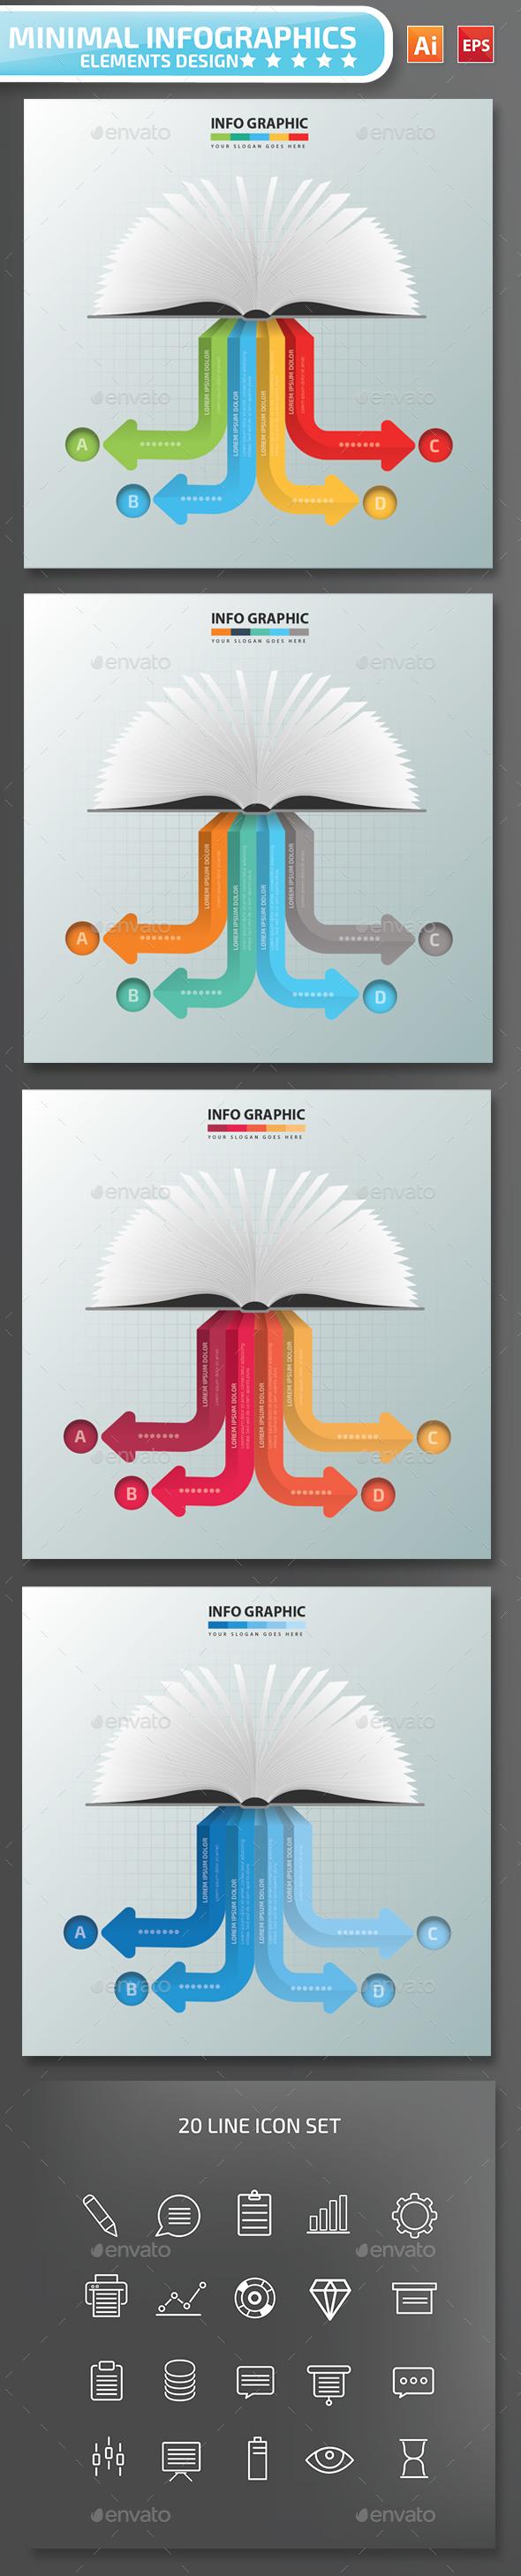 Minimal Book Infographics Design 01 - Infographics